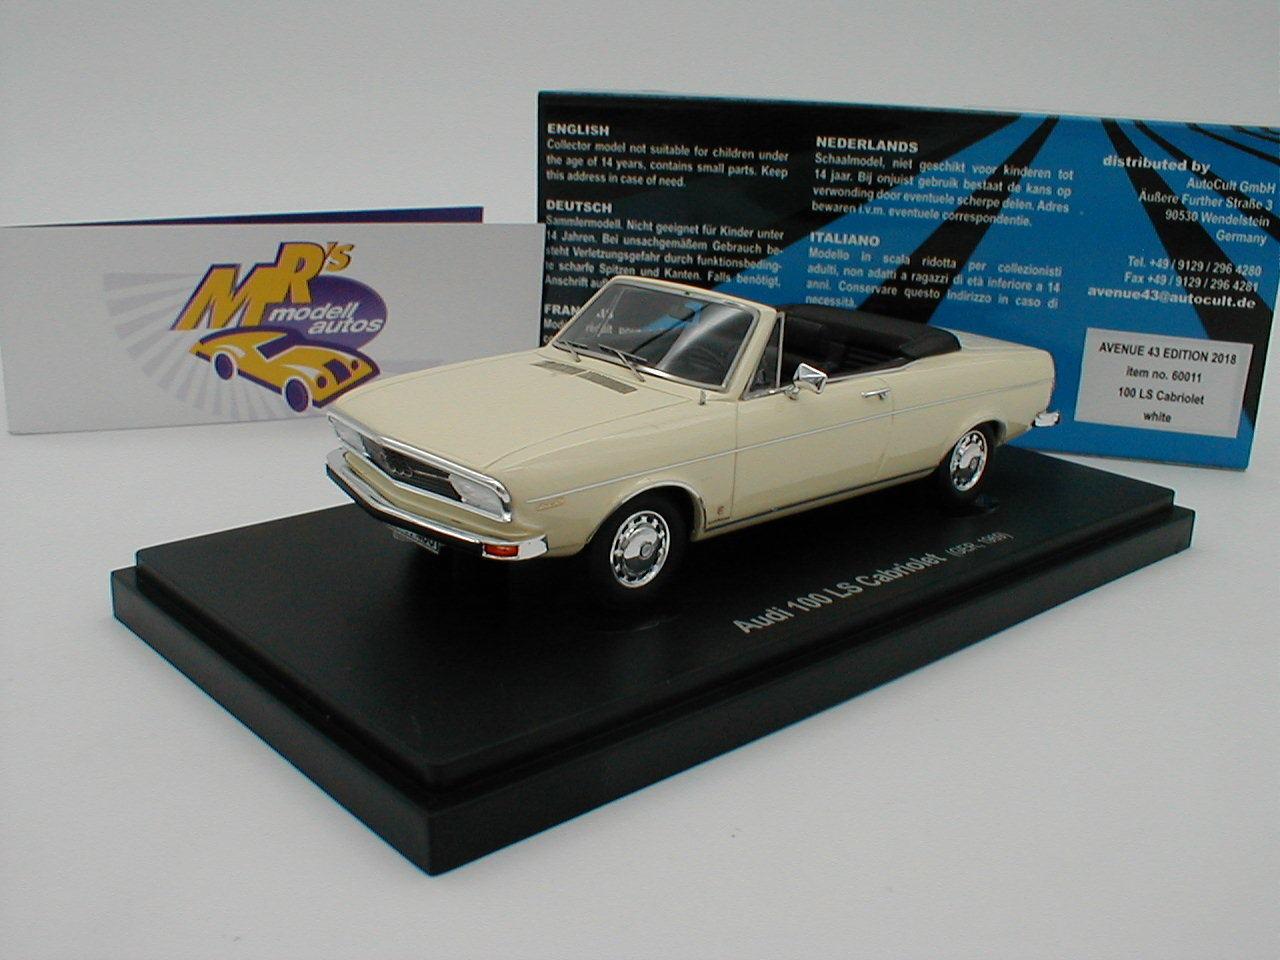 Autocult avenue 43 60011 - audi 100 ls cabriolet bj.1968 in  elfenbein  1 43